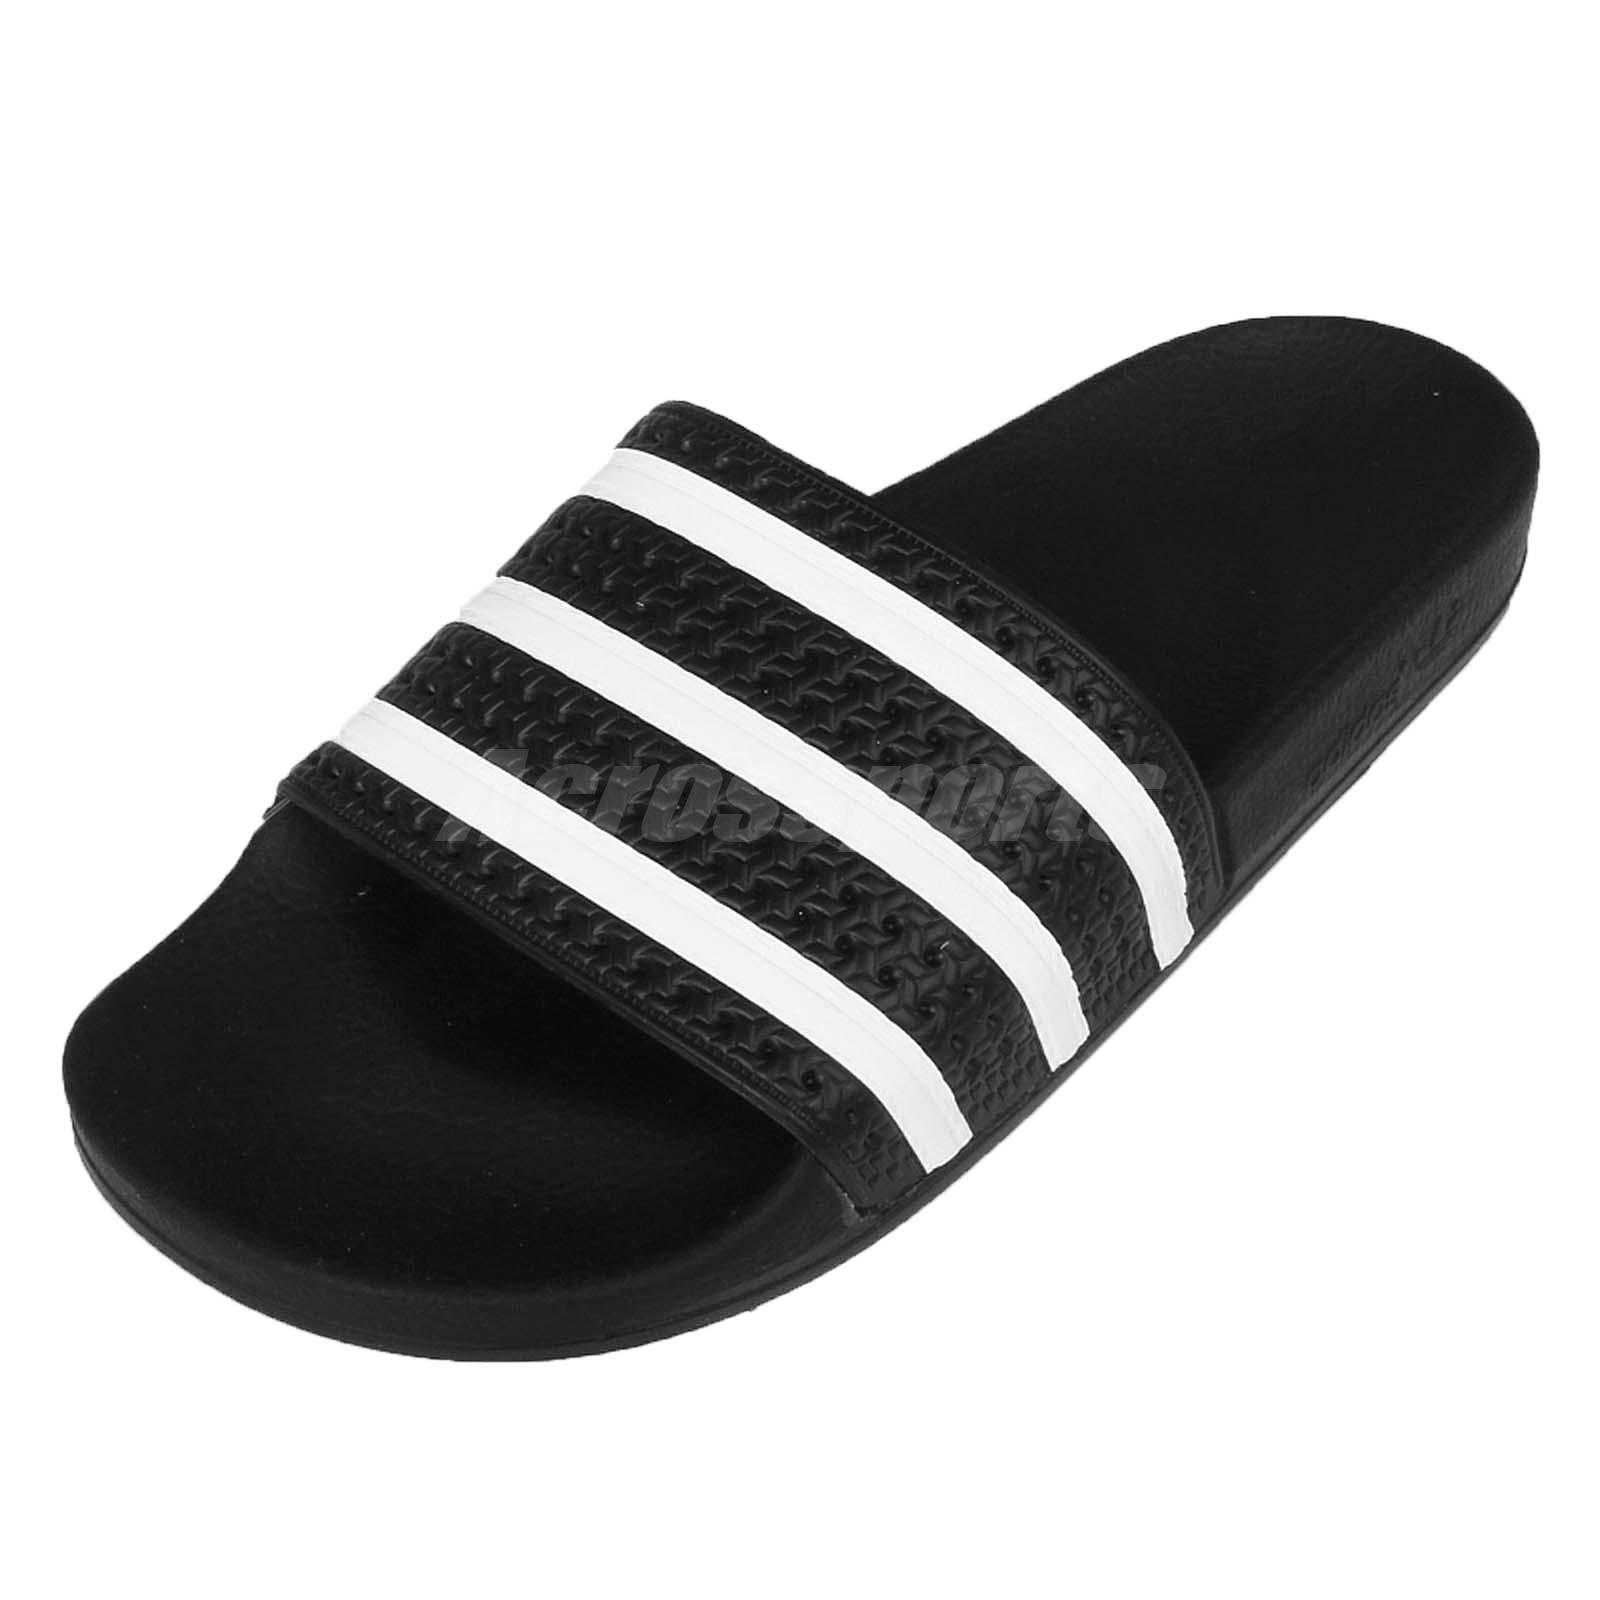 gran venta sitio oficial como escoger adidas Performance Adilette Black White Men Sports Sandal Slide ...